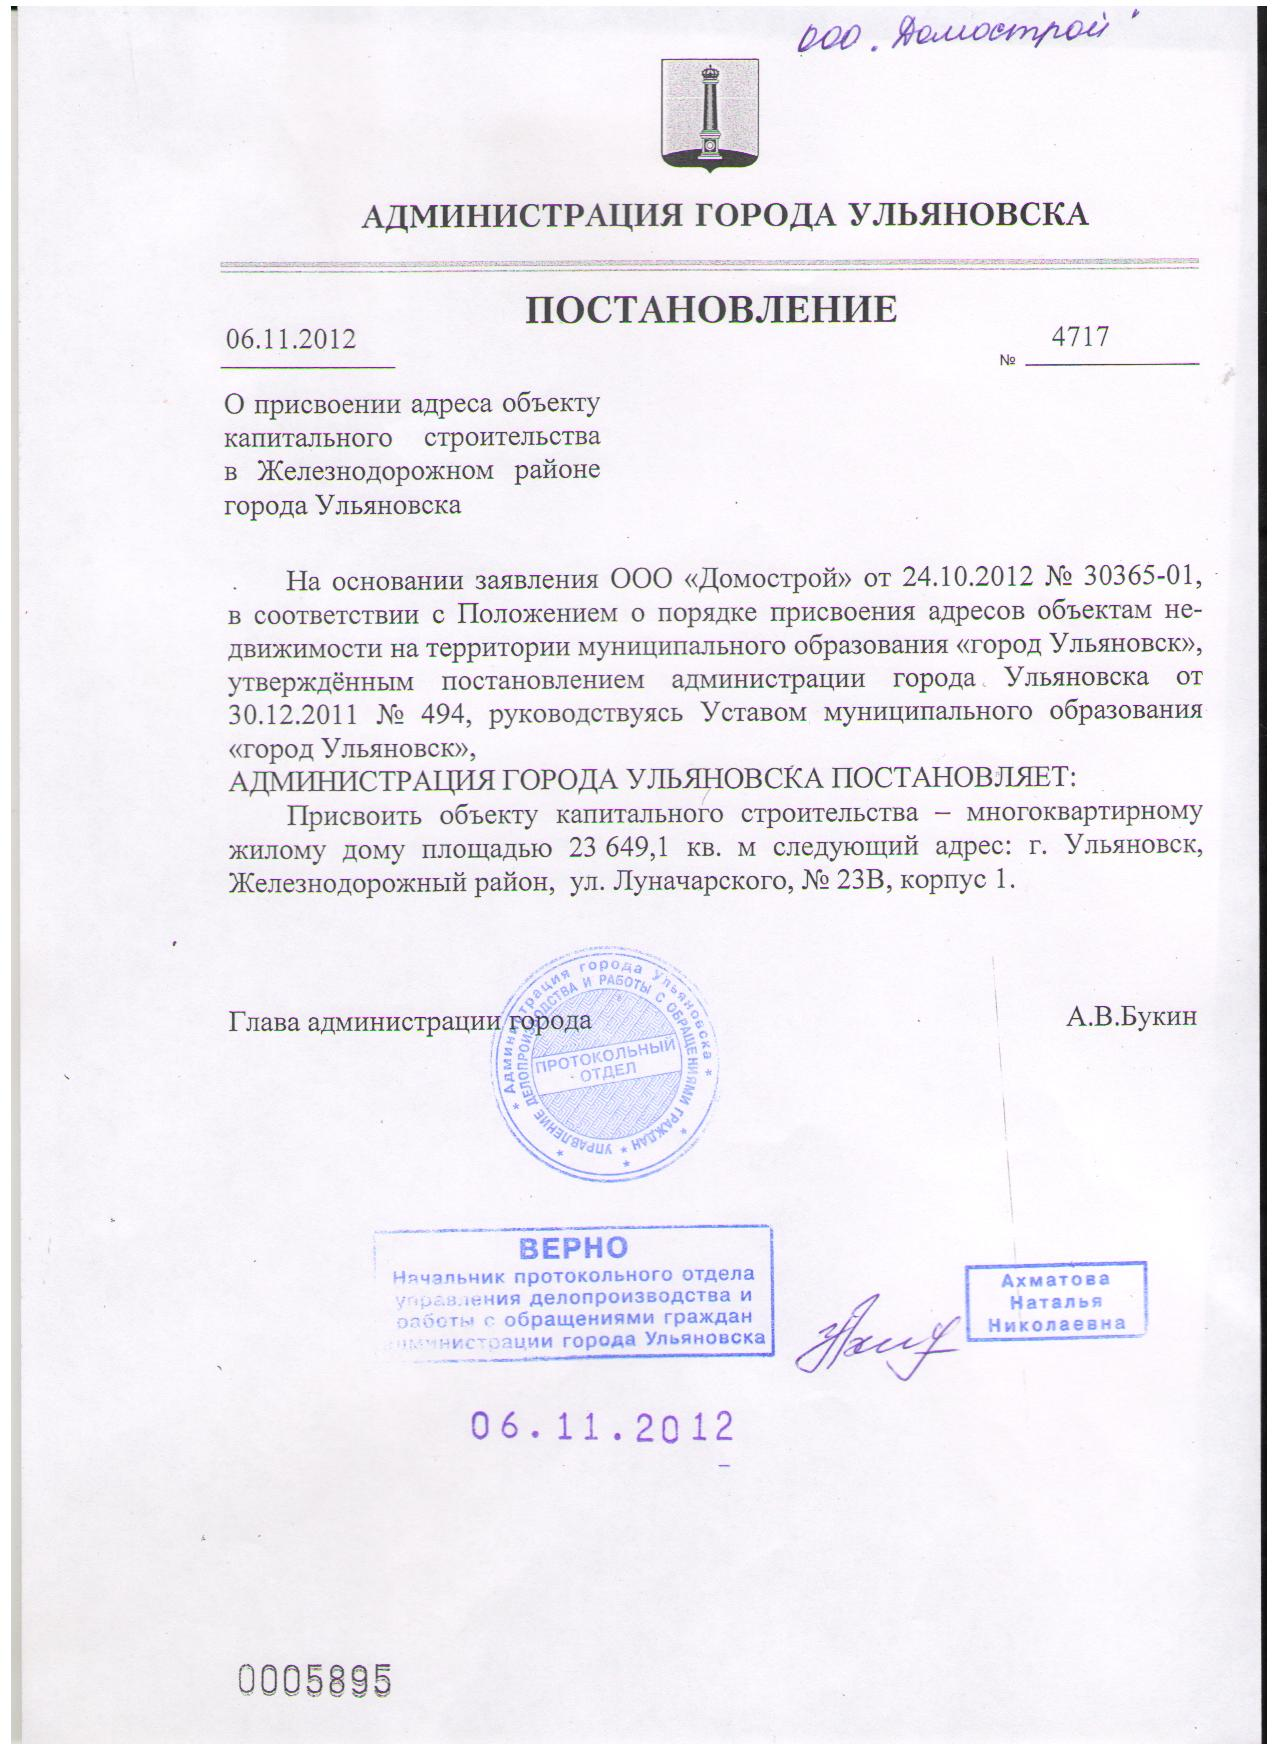 Дольщики Ульяновска - Портал Ddddnn11